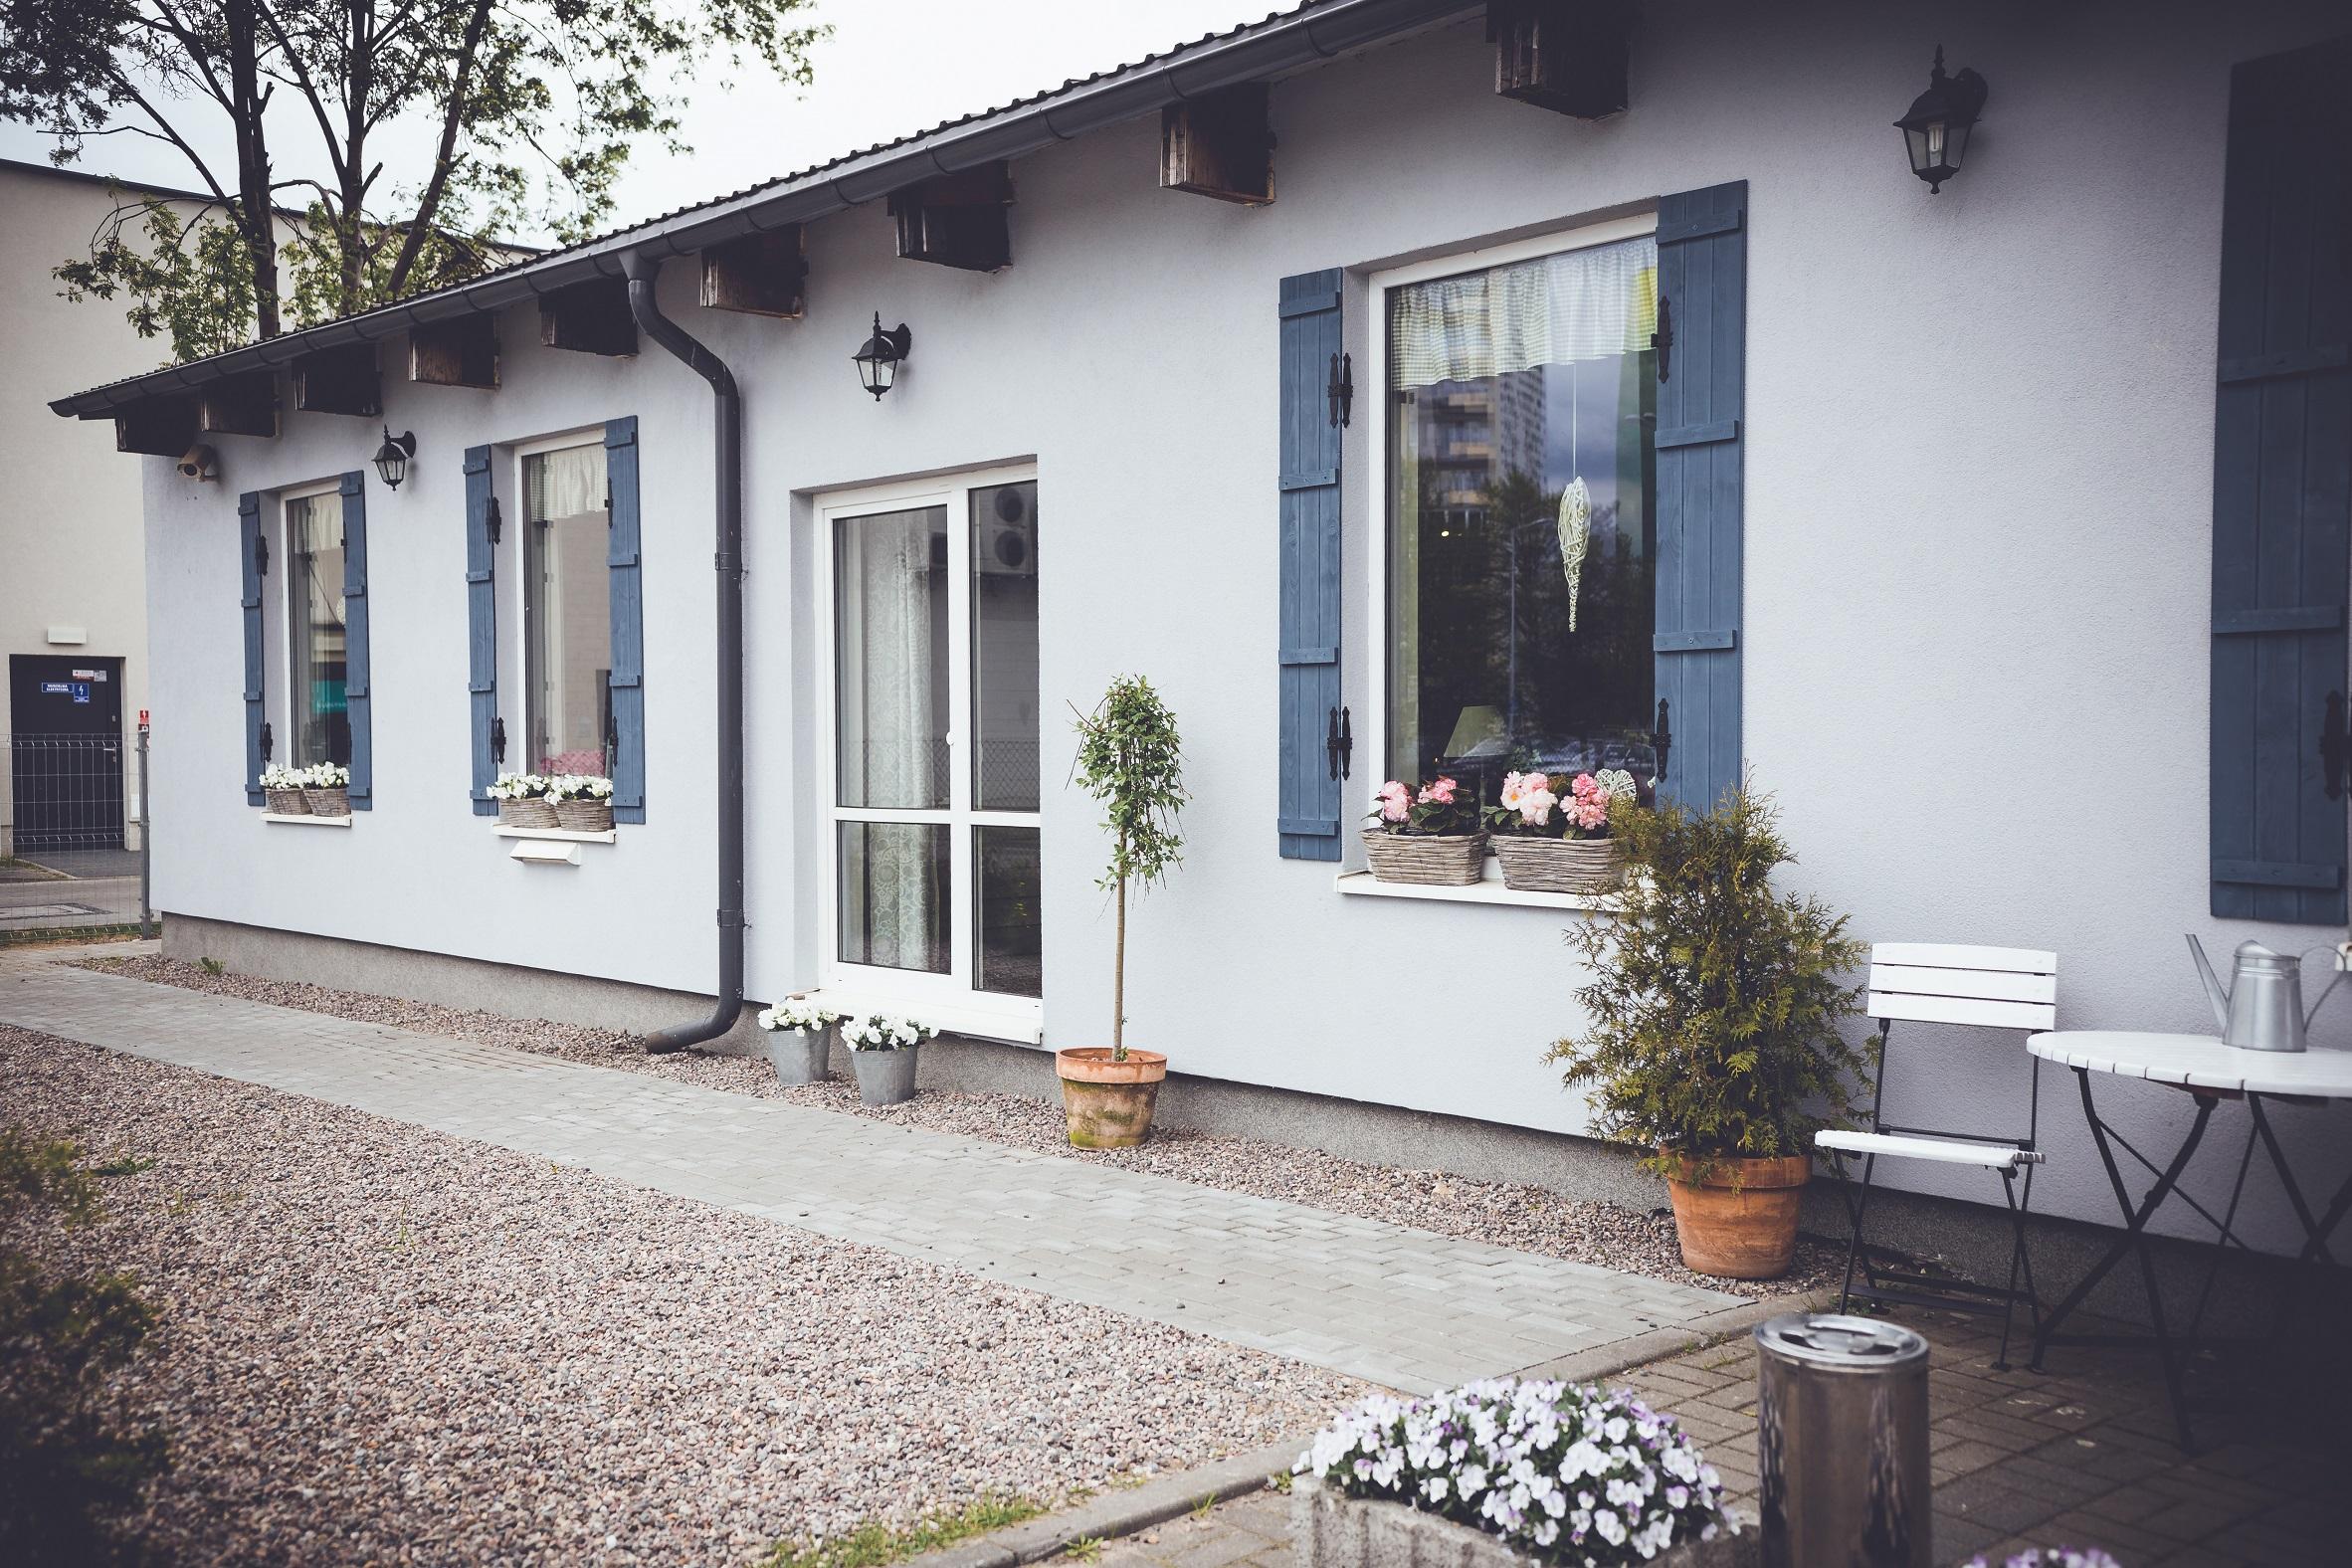 Lawenda Restauracja Gdańsk